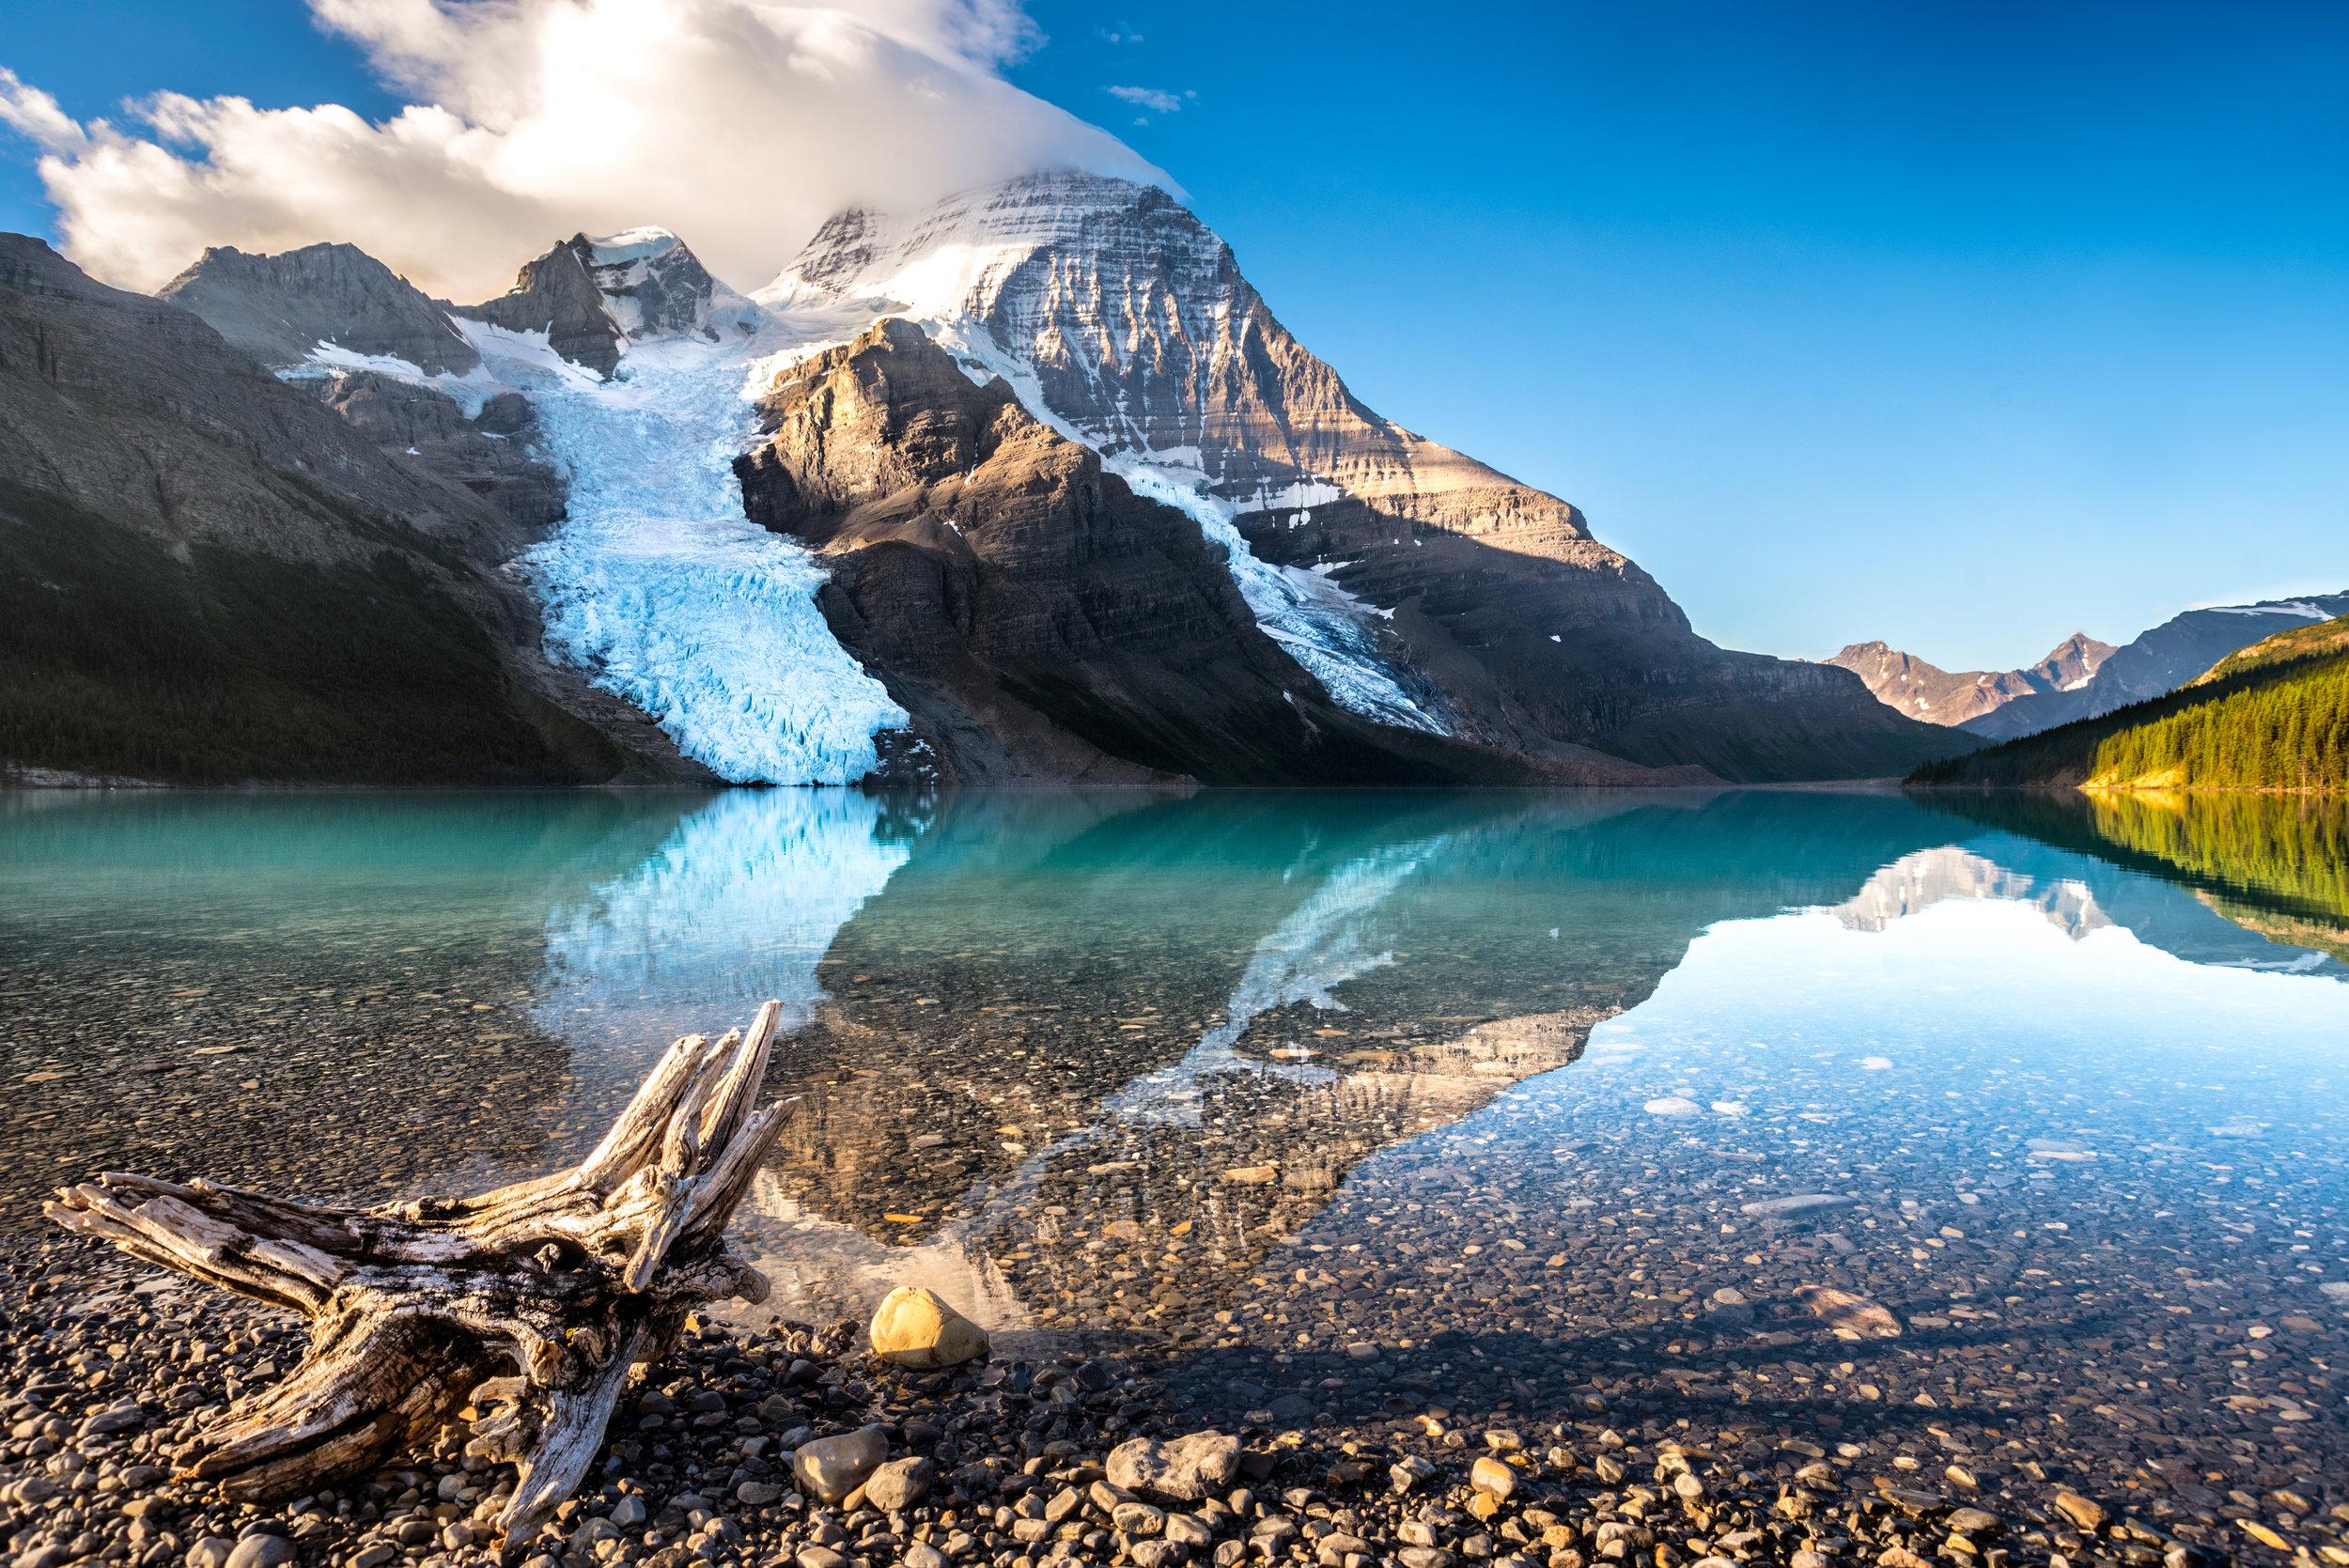 Early morning light at Berg Lake  - Mount Robson Provincial Park, British Columbia